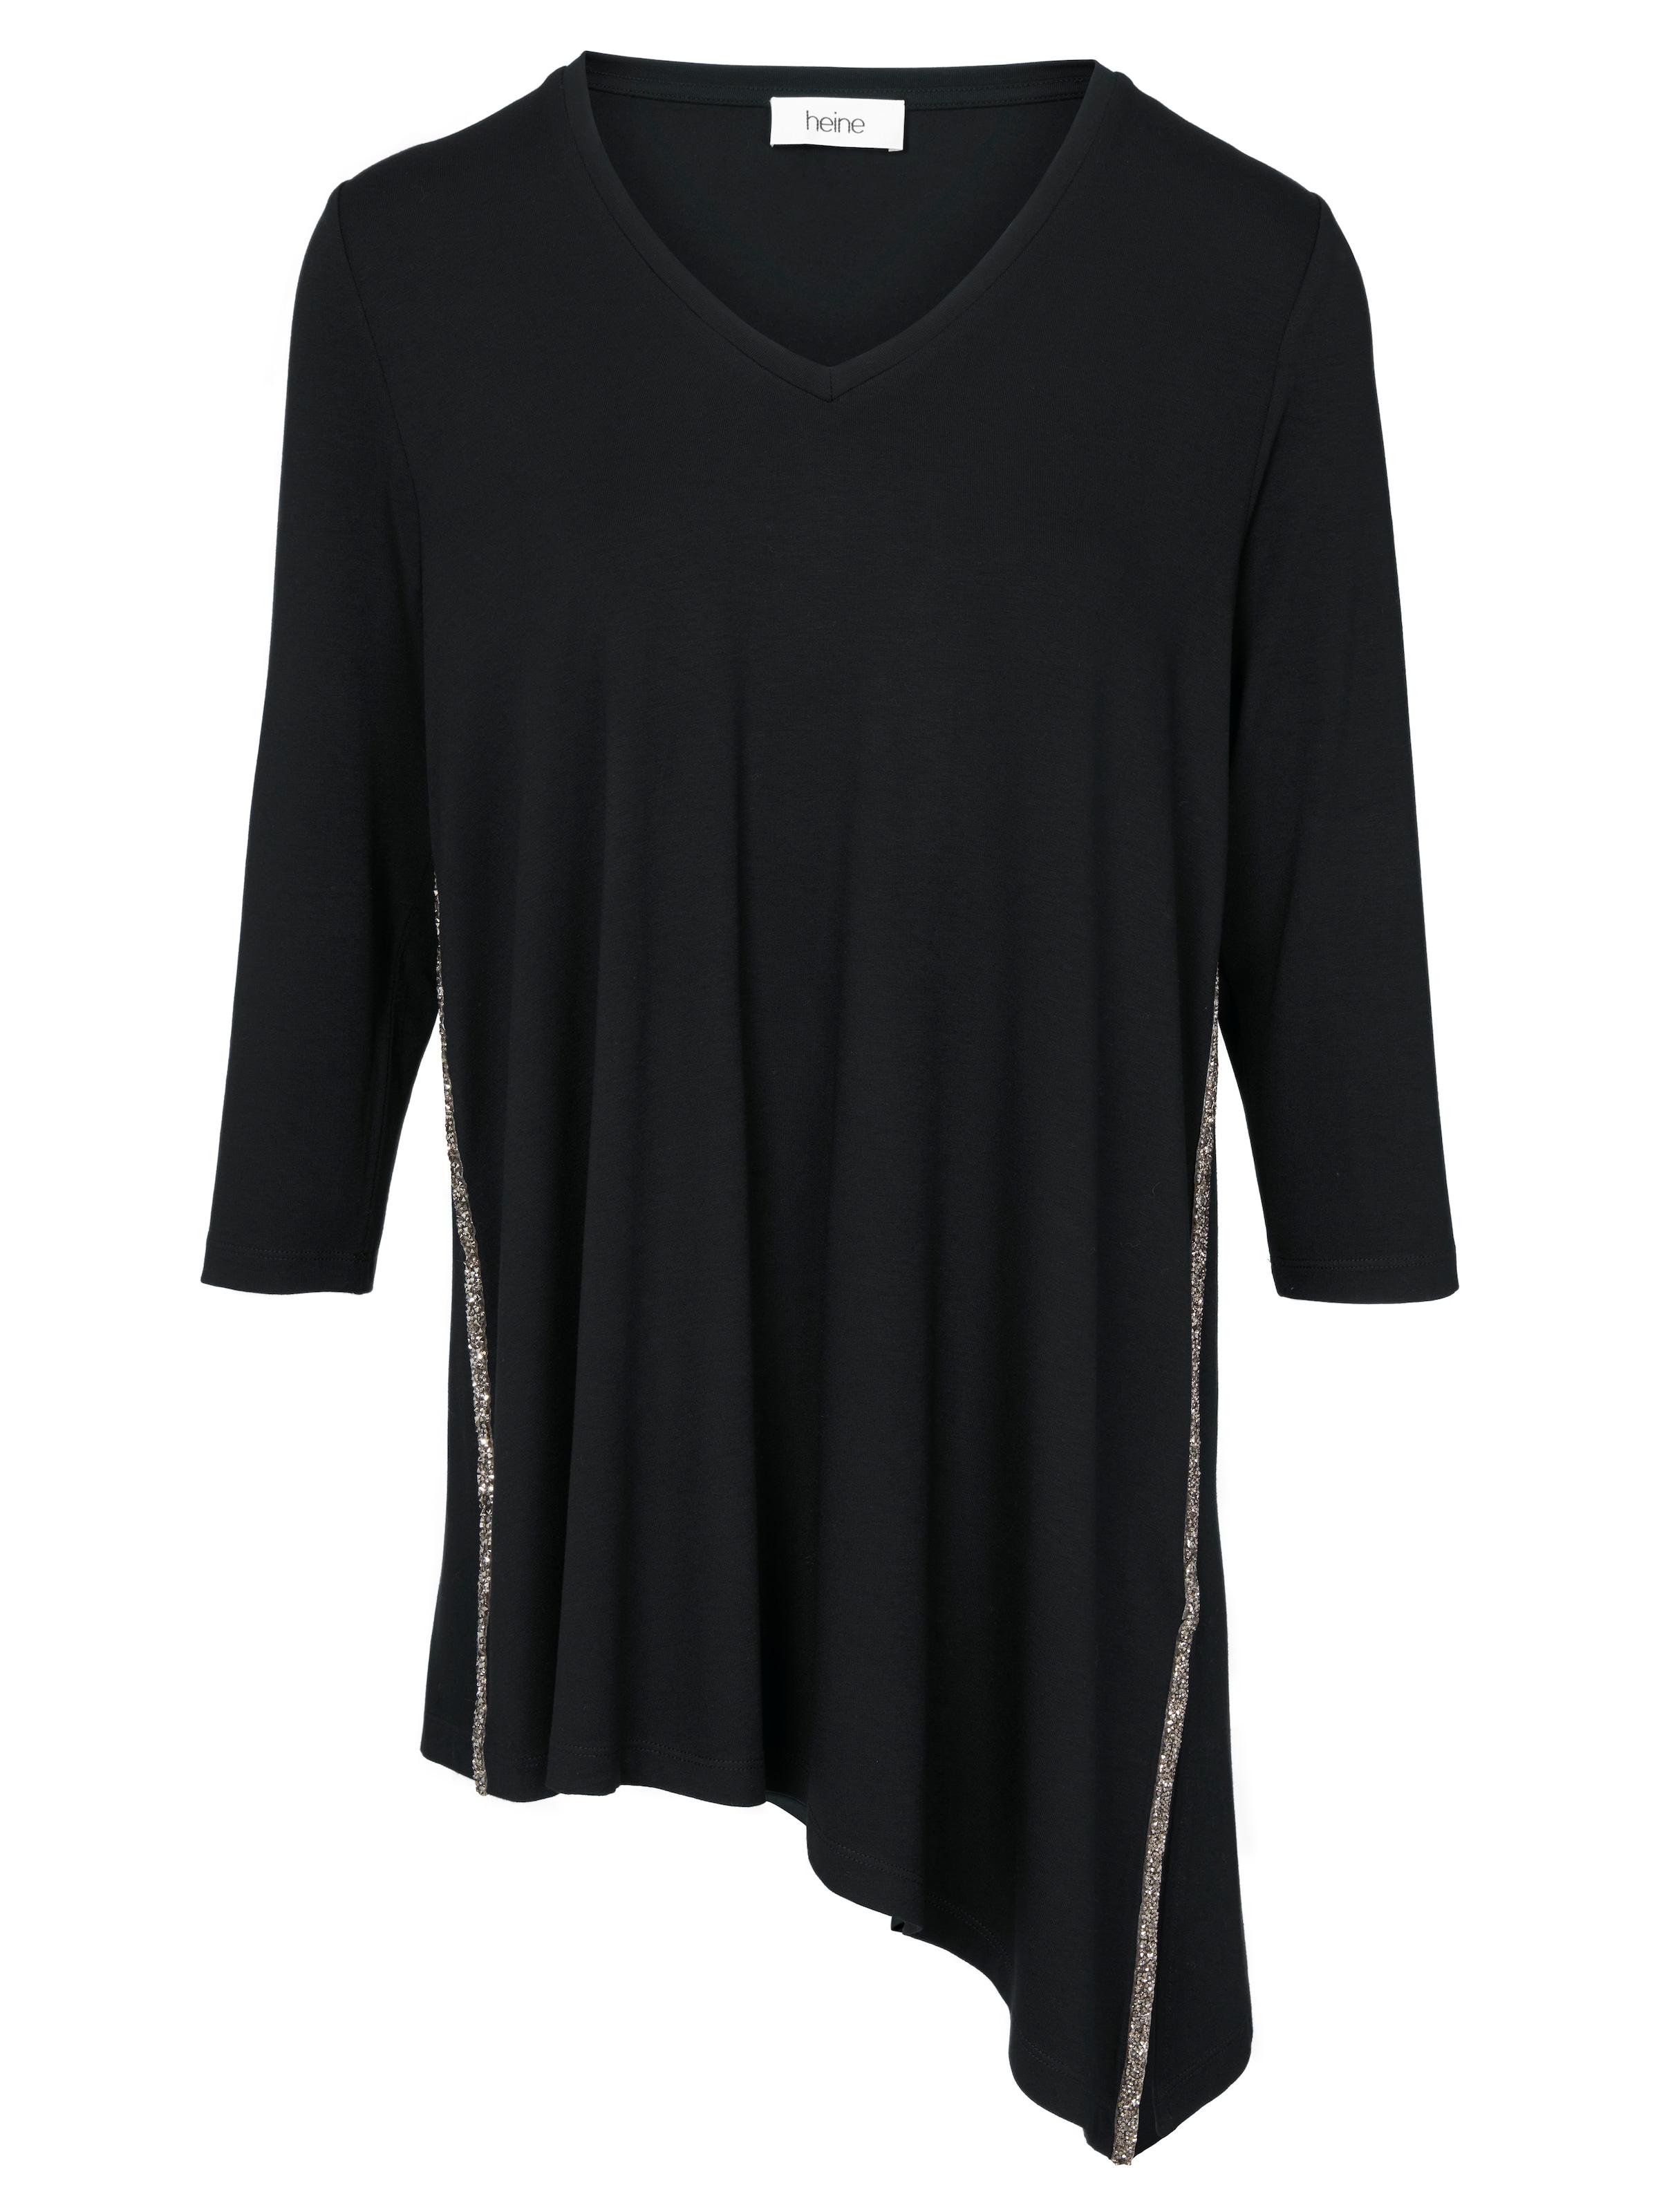 T Heine T Noir shirt En En T En shirt Noir Heine Heine shirt SVpzLqUMG